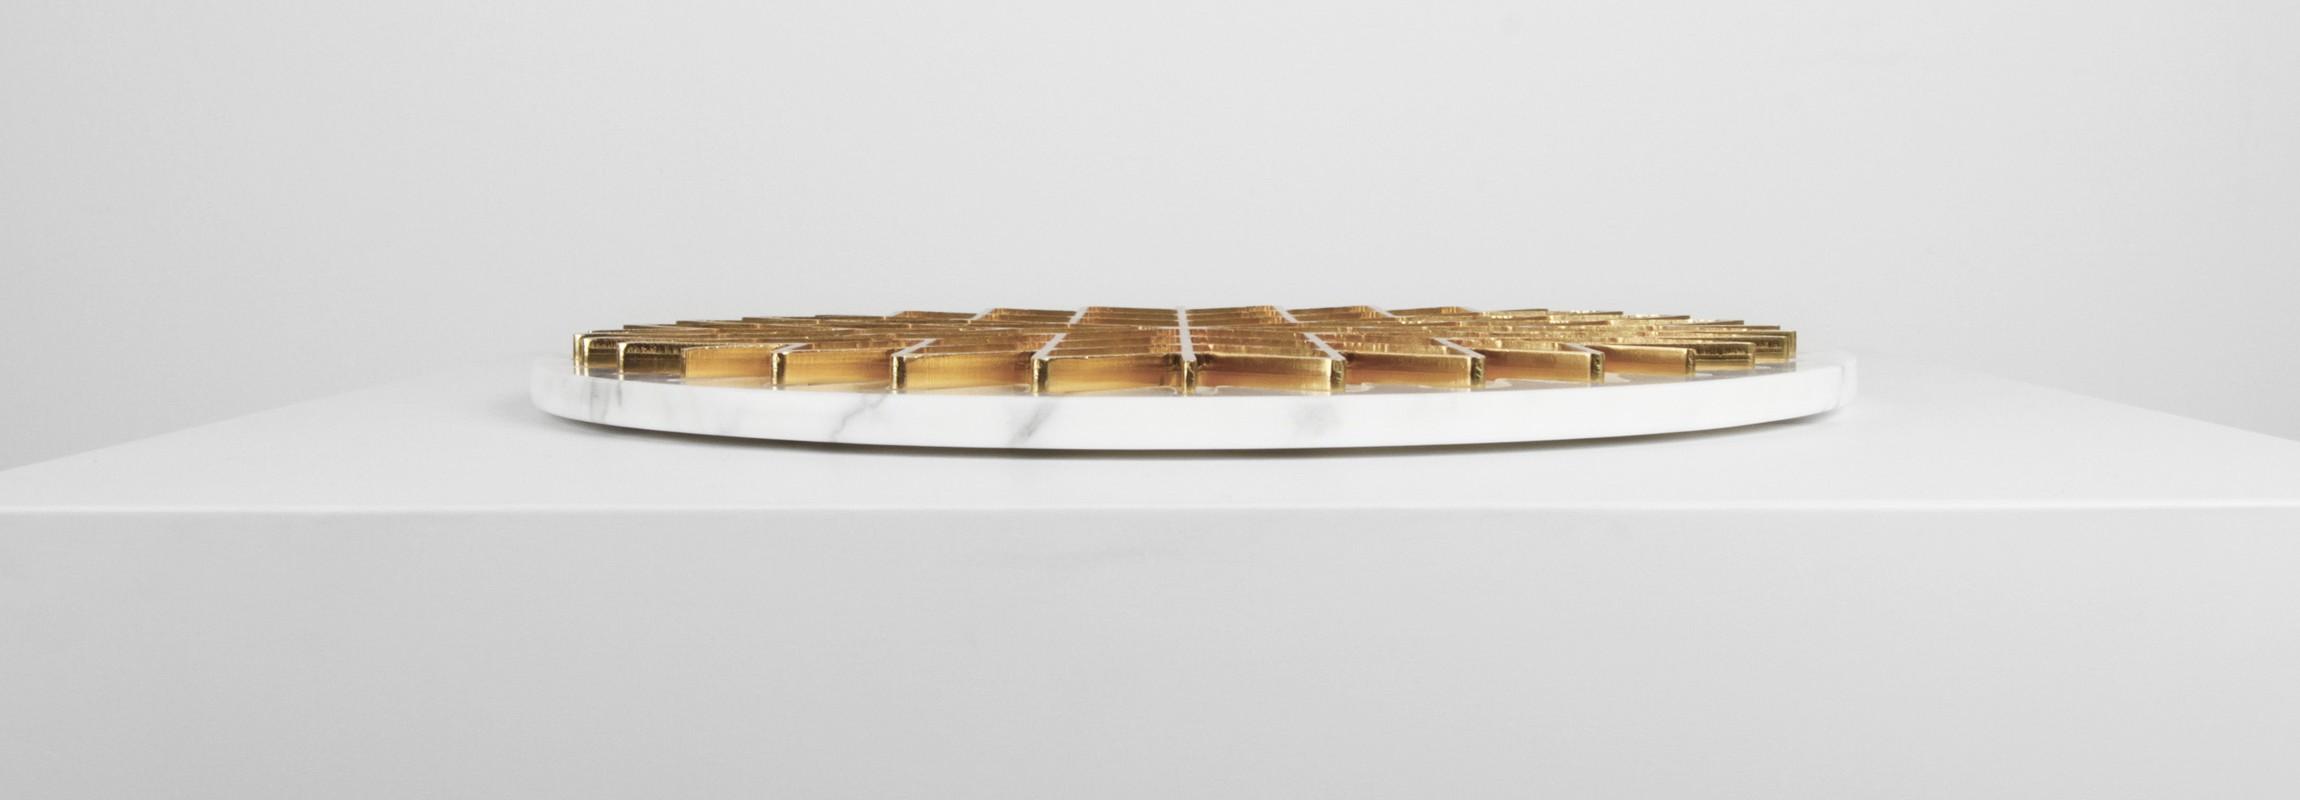 Kibbe plate - SAYAR&GARIBEH (1)